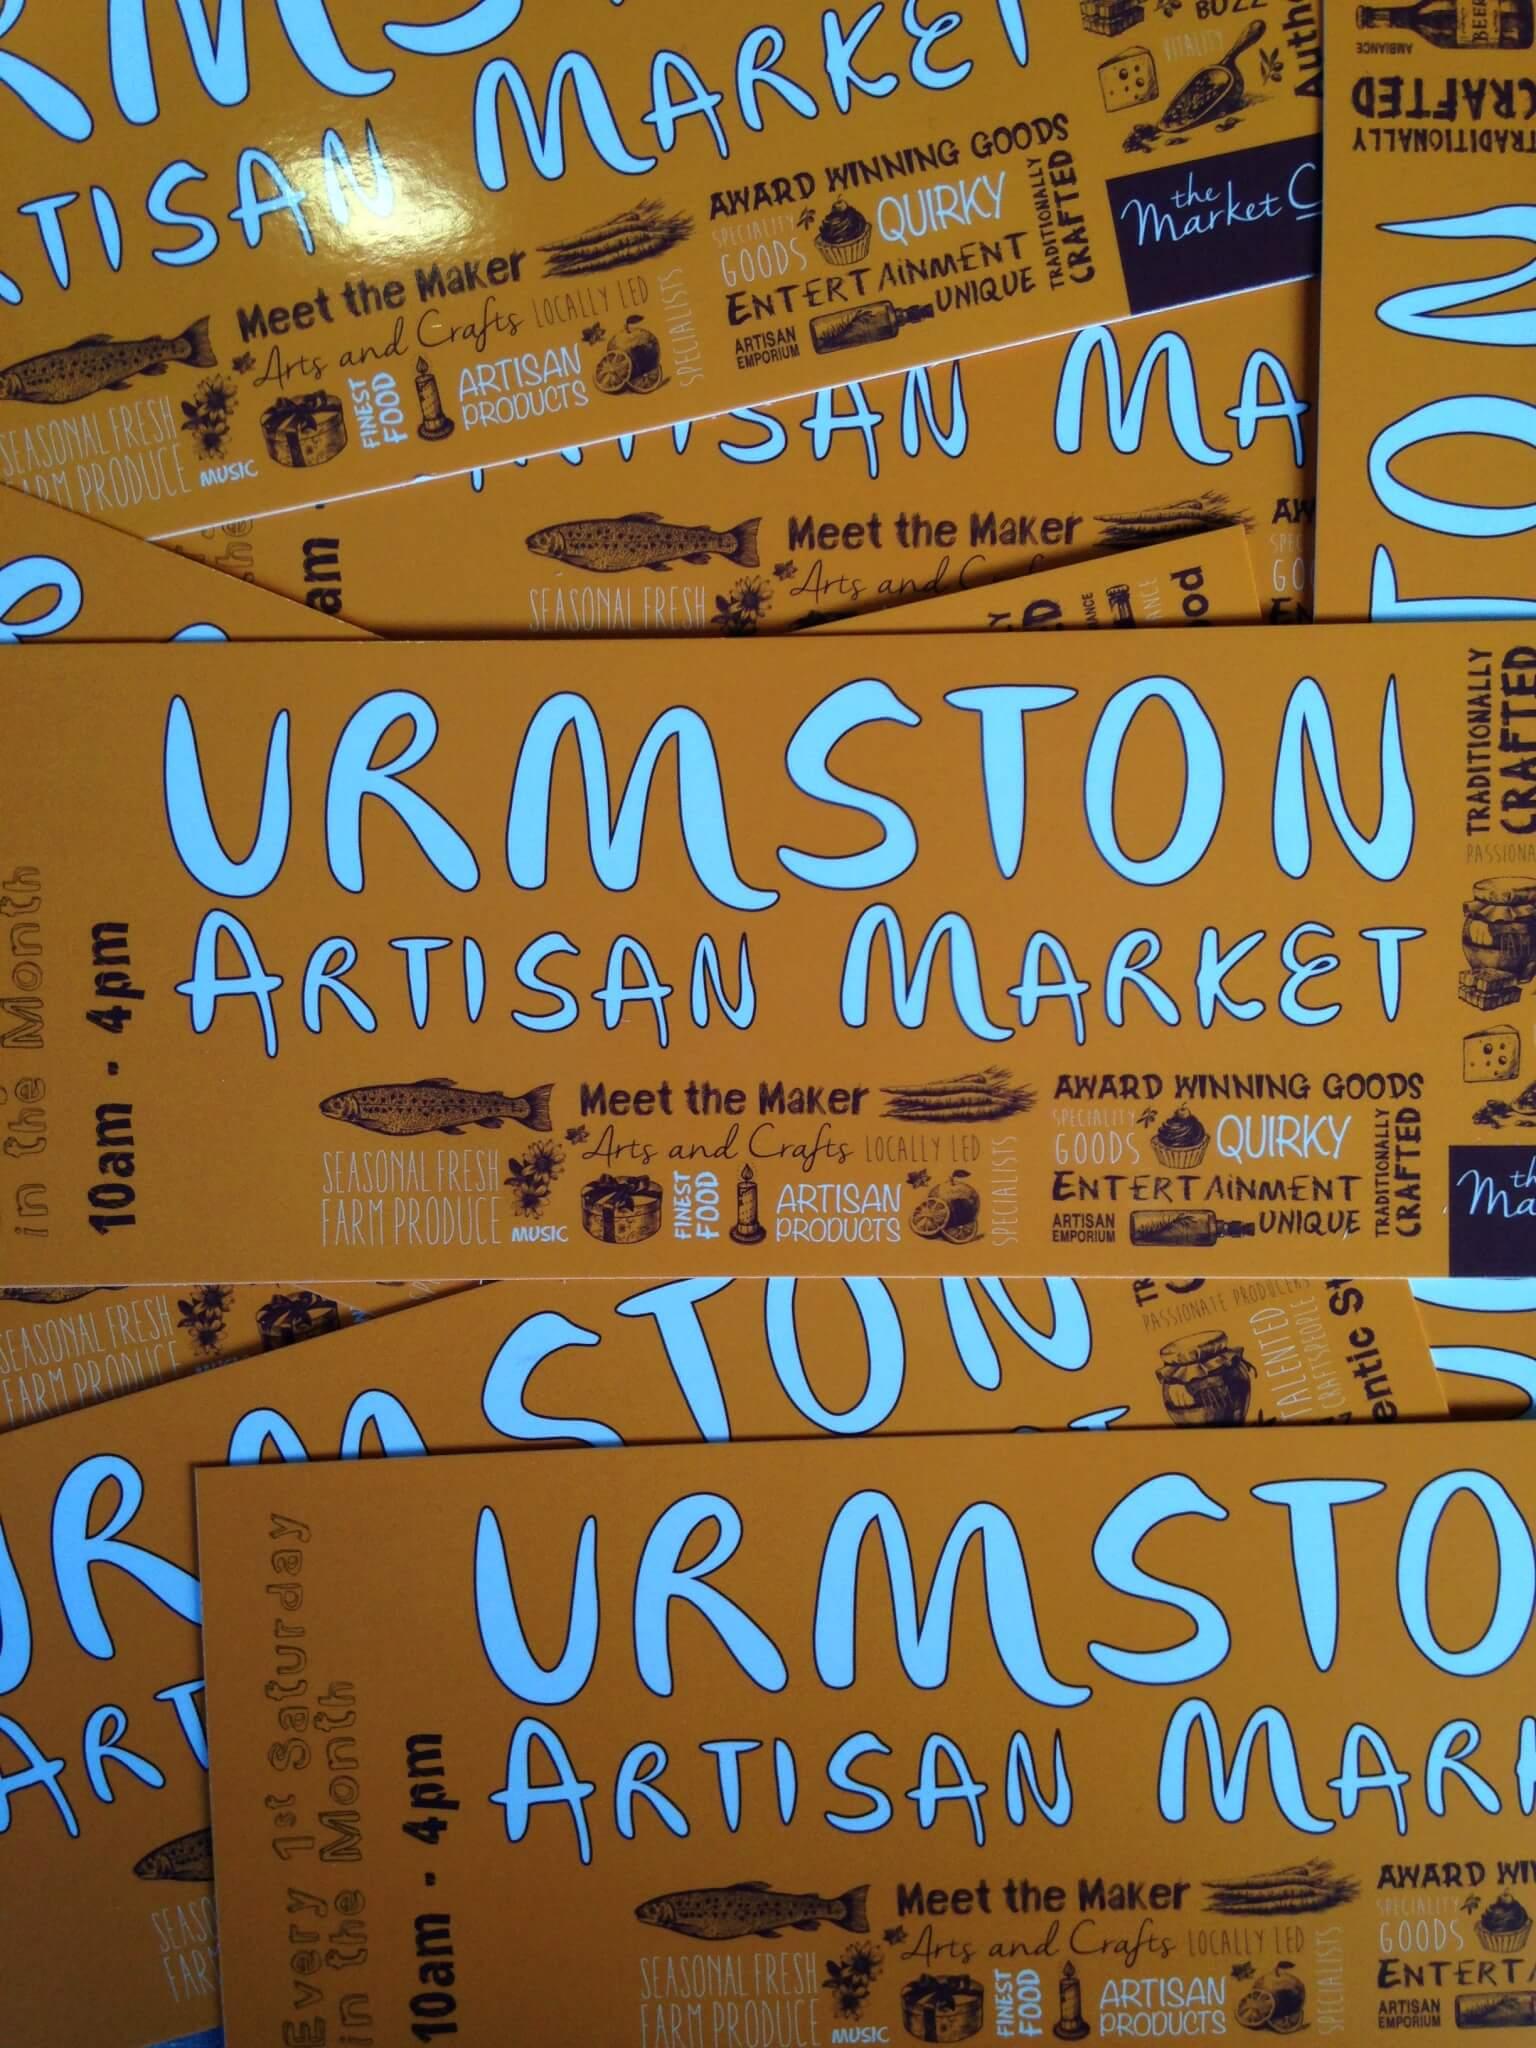 Urmston Artisan Market